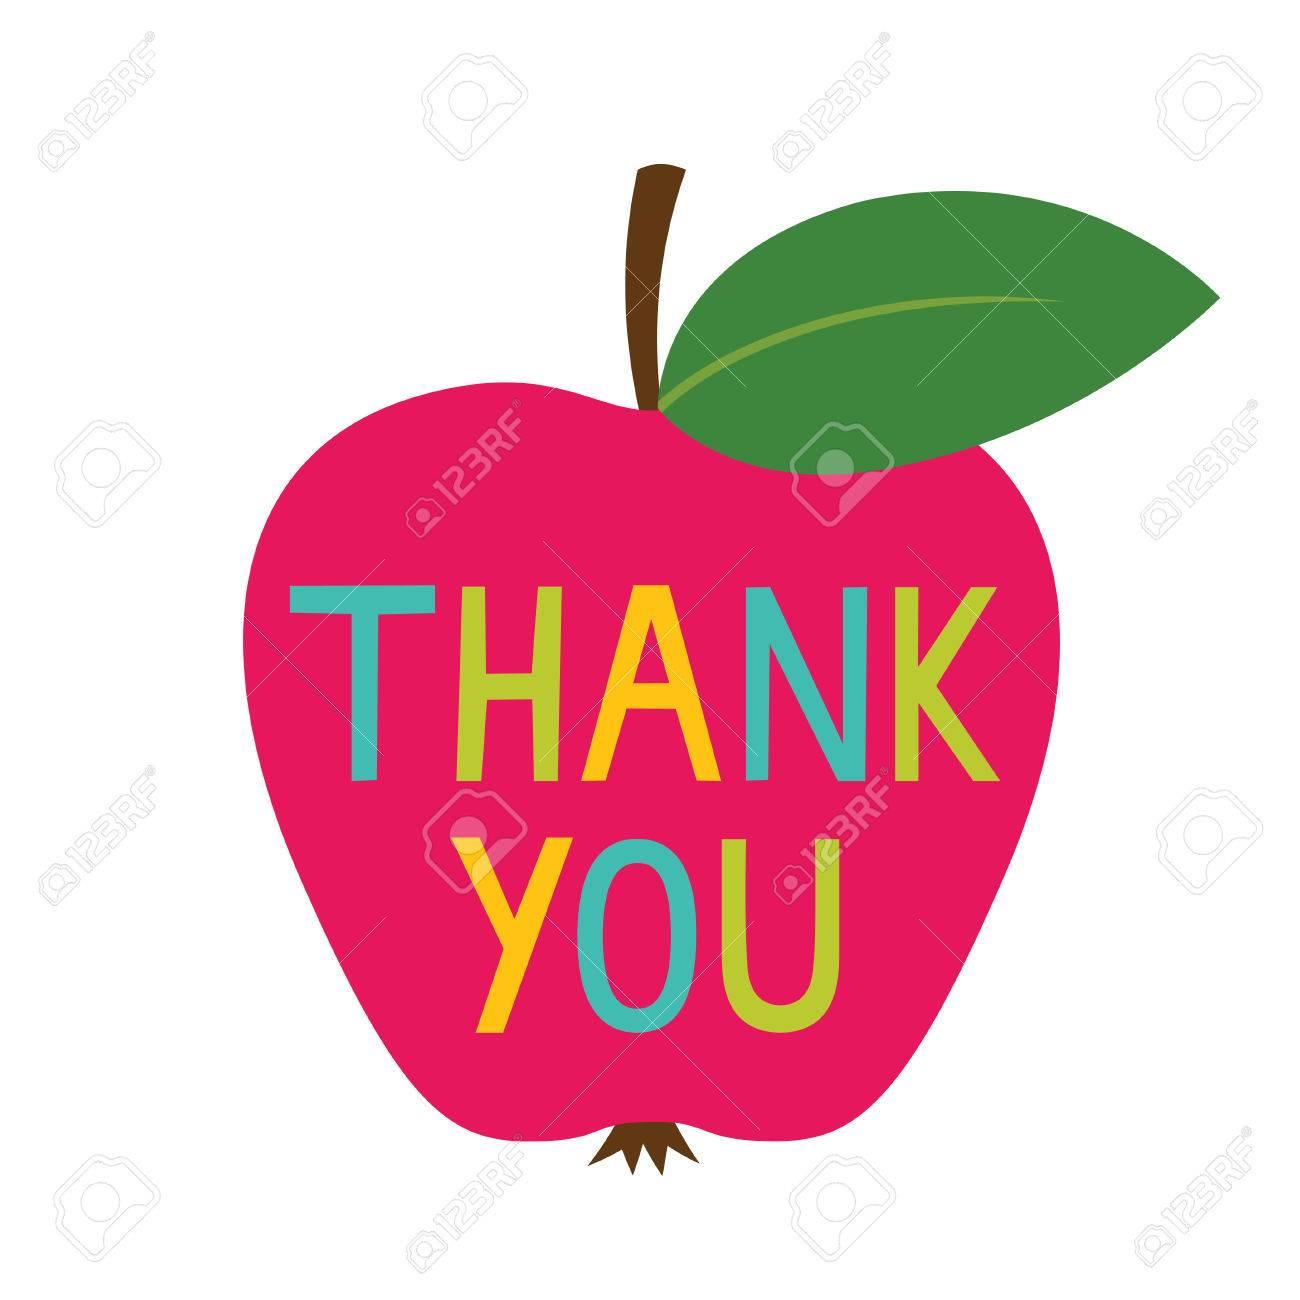 Thank you teachers day card royalty free cliparts vectors and thank you teachers day card stock vector 76759823 voltagebd Choice Image